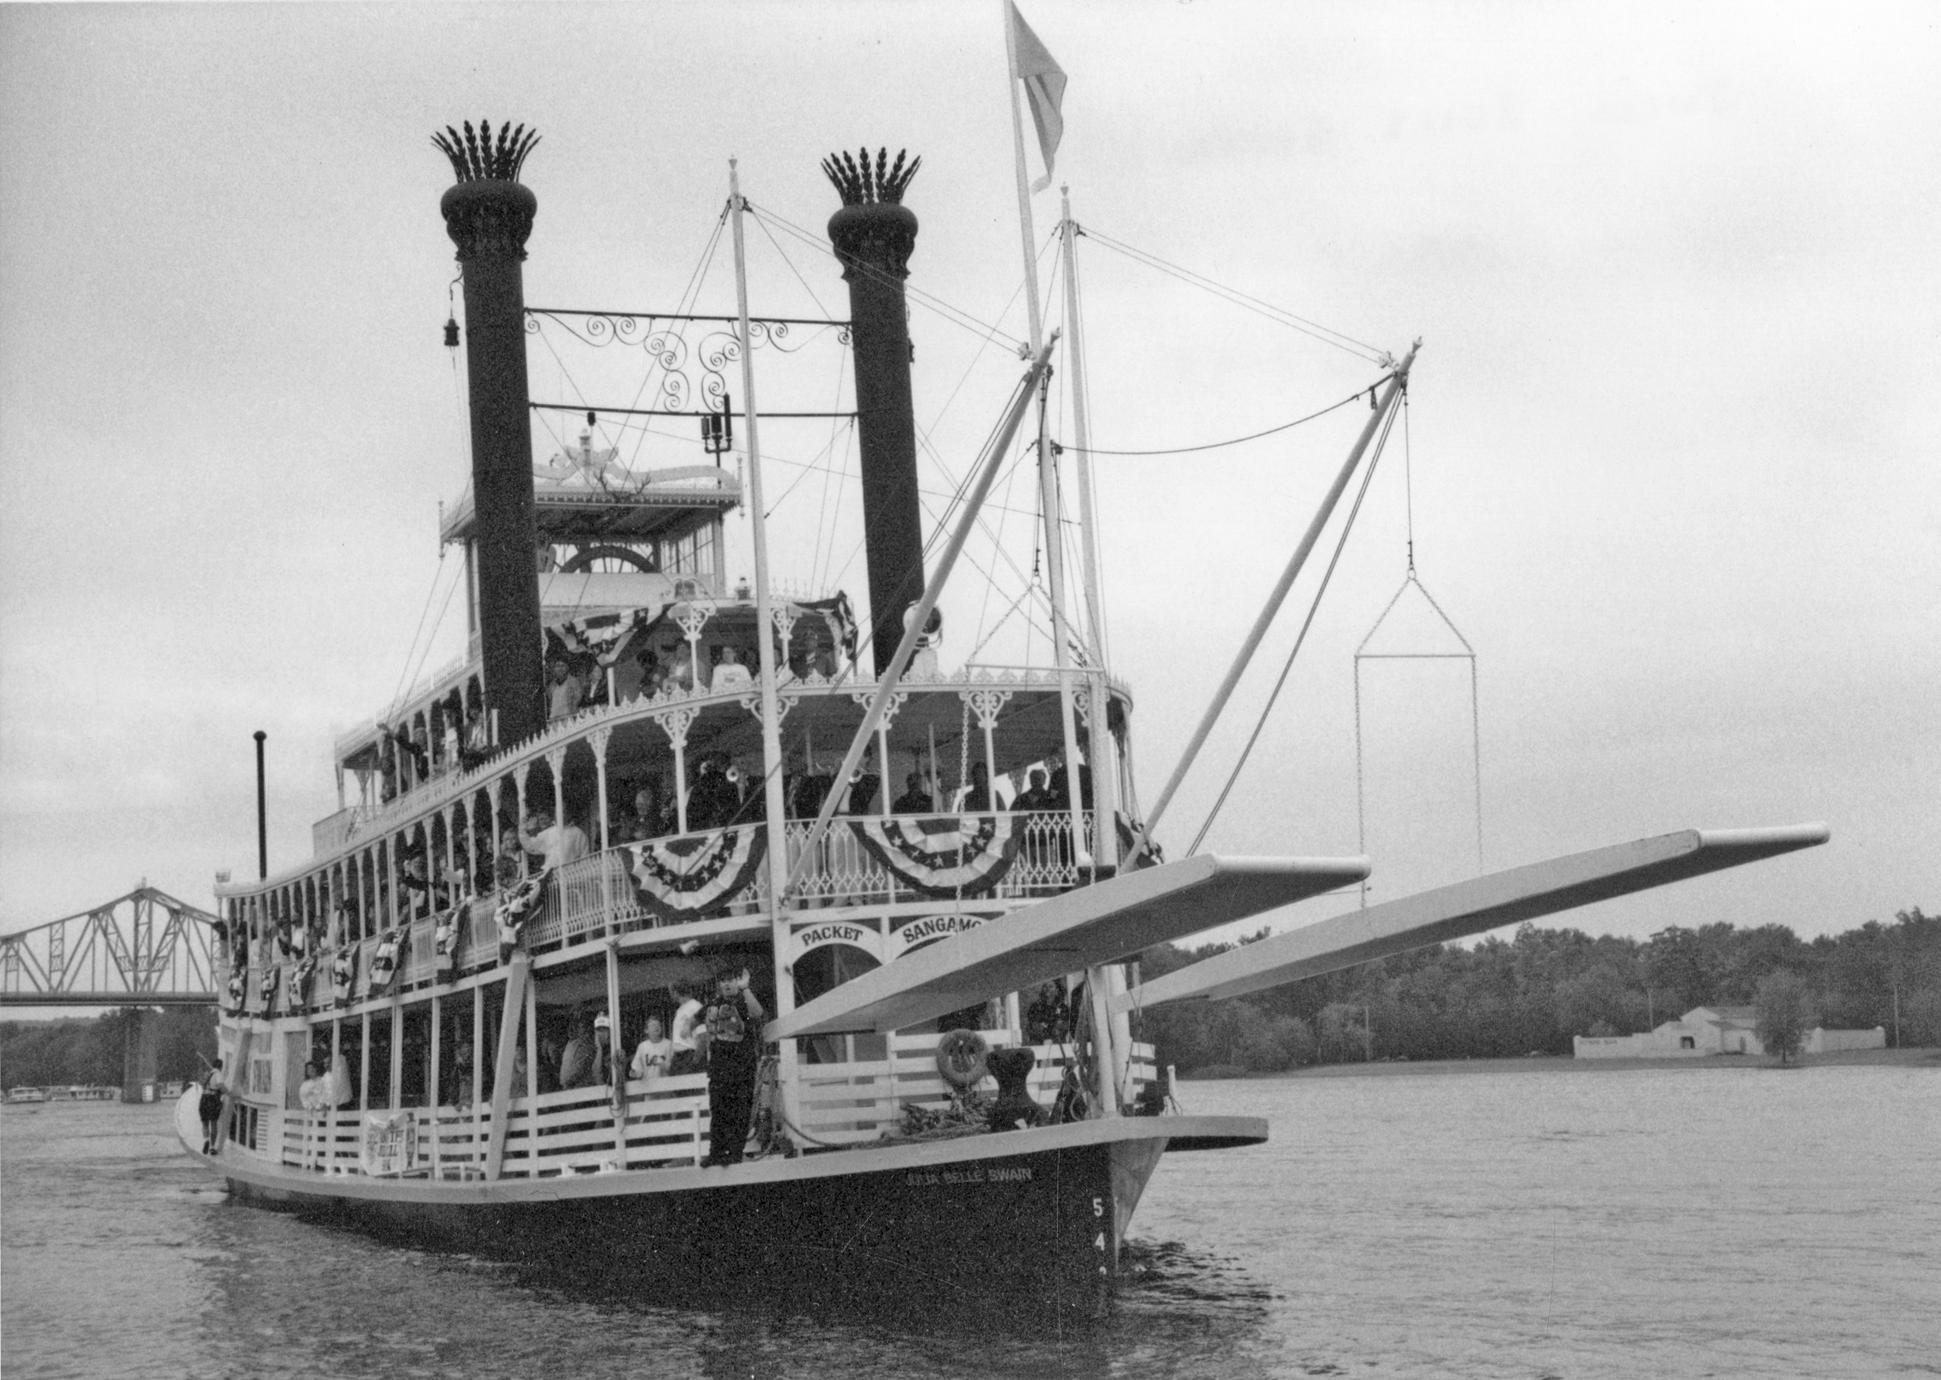 Julia Belle Swain (Excursion boat, 1971-)